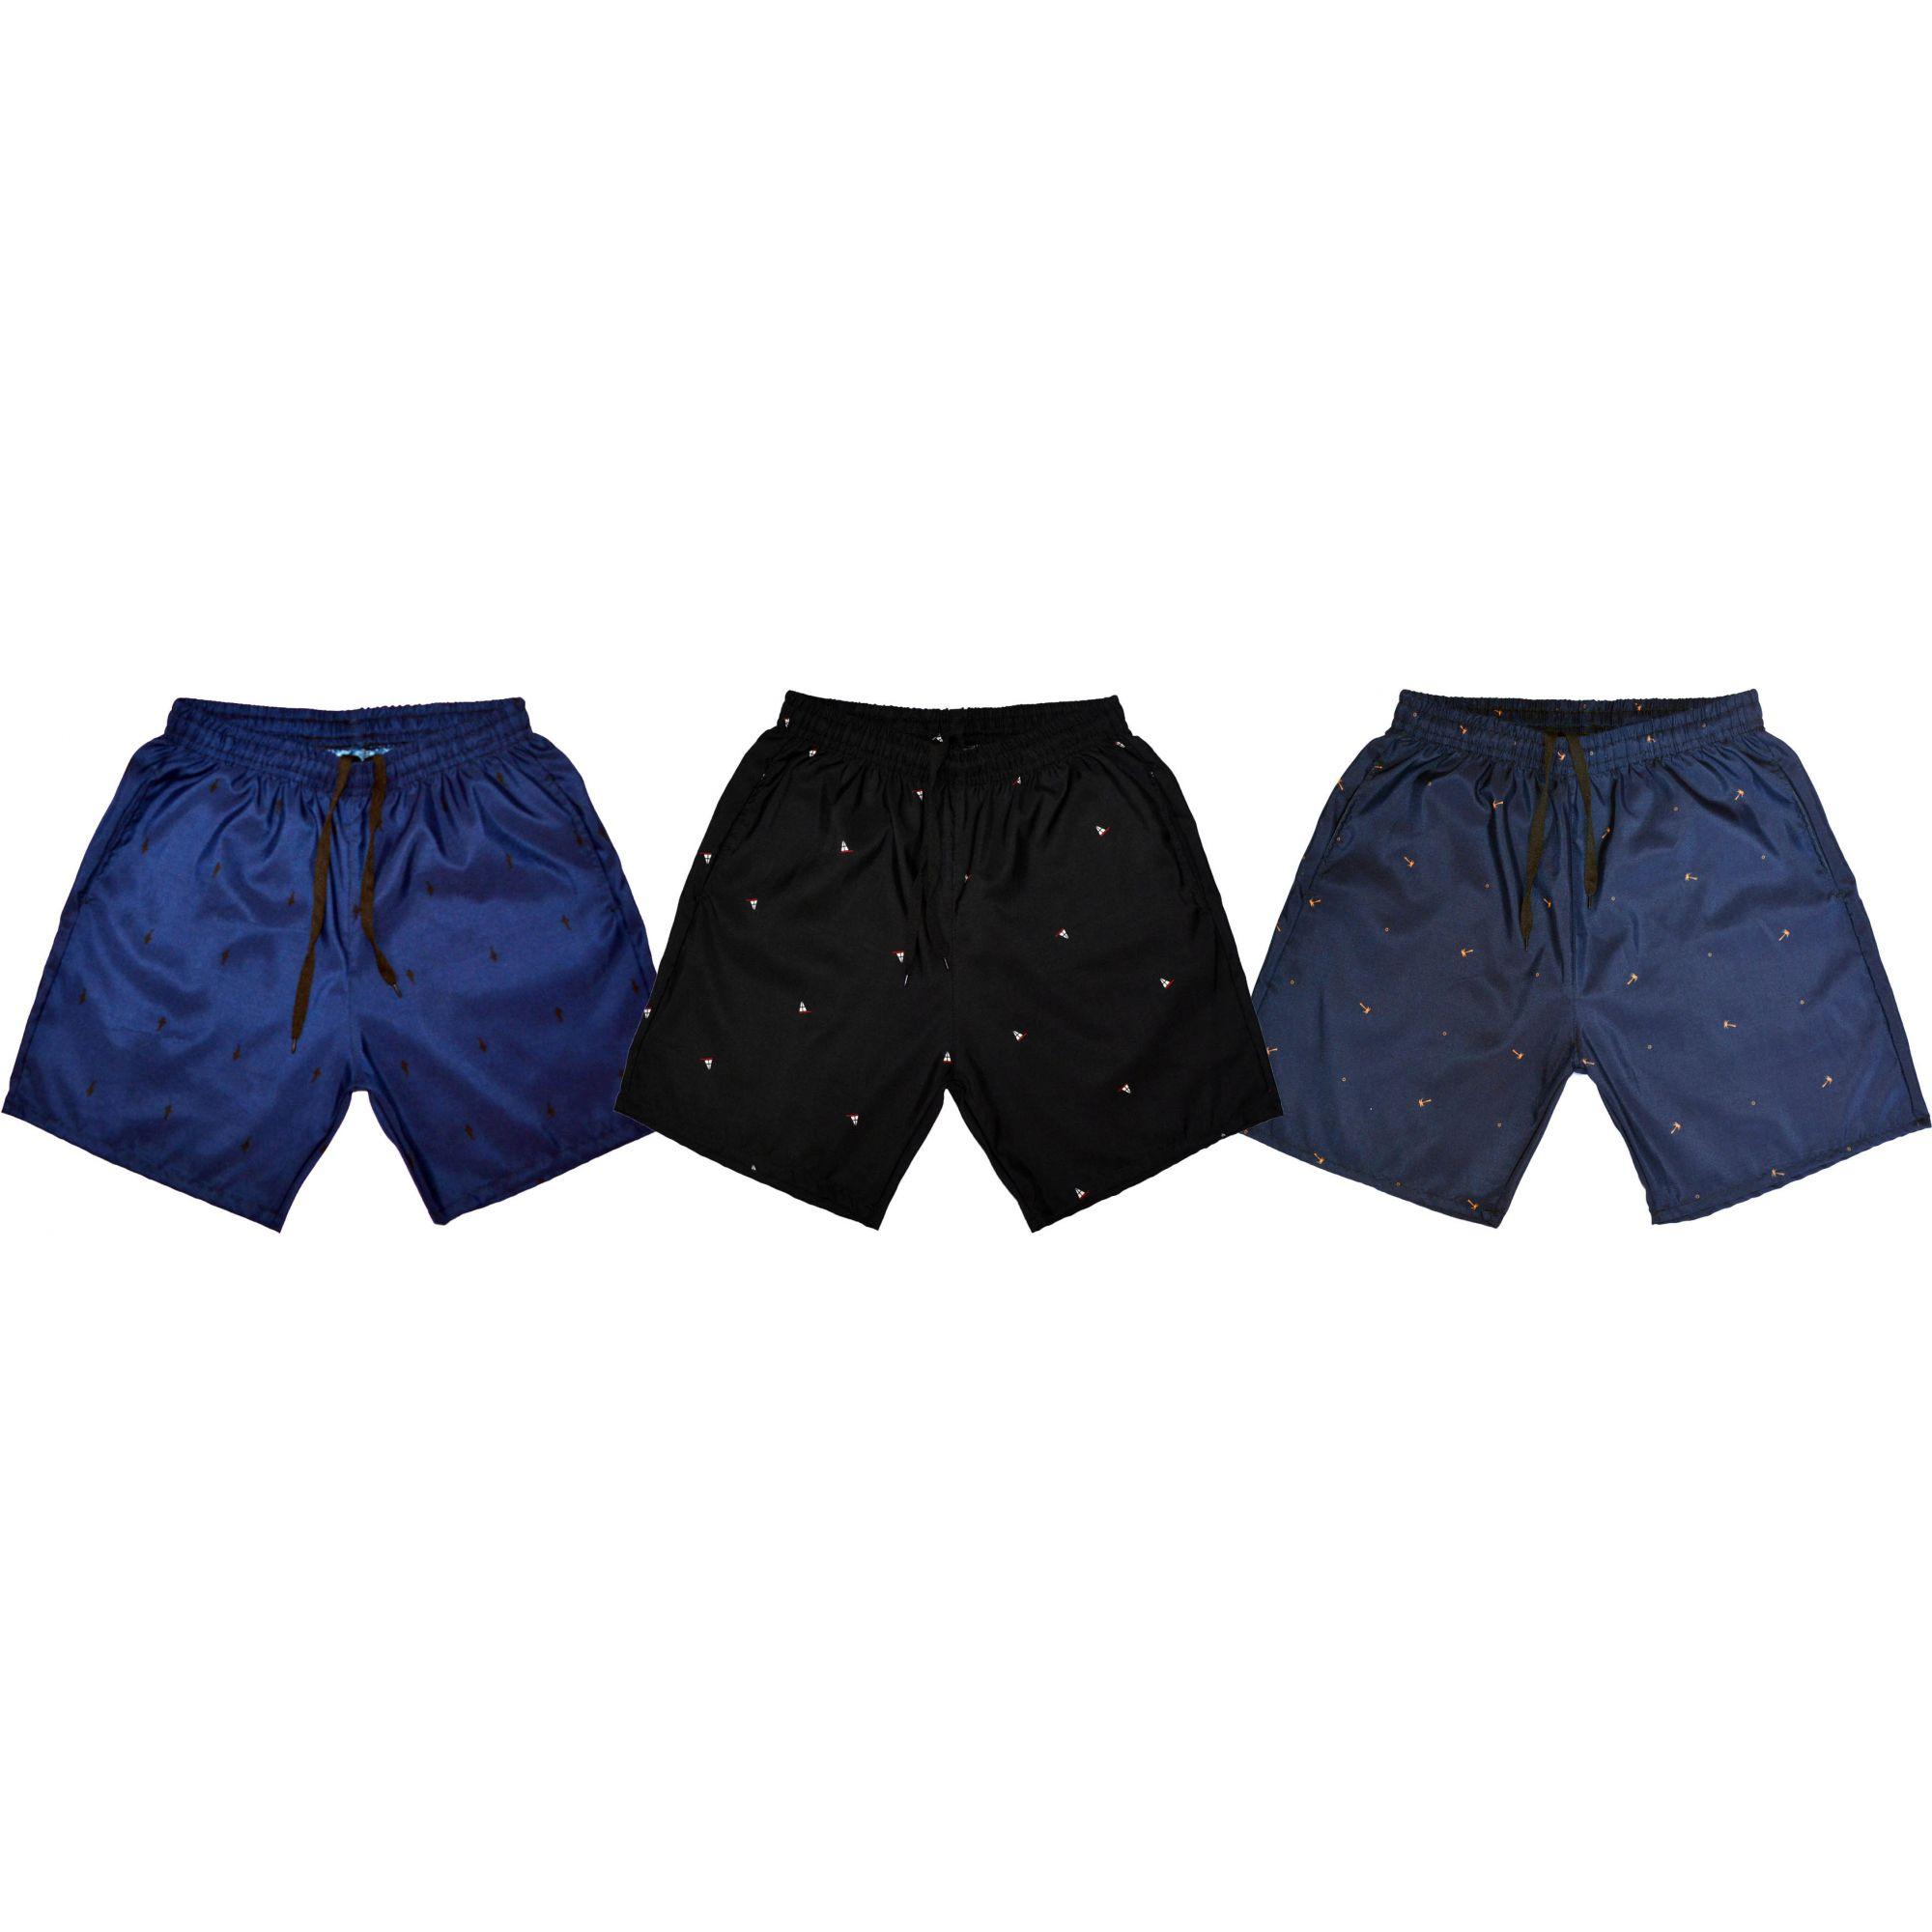 Kit 3 Shorts Praia Microfibra Estampado Masculino Ref.386 - Frent´s ab40eabea8d6a